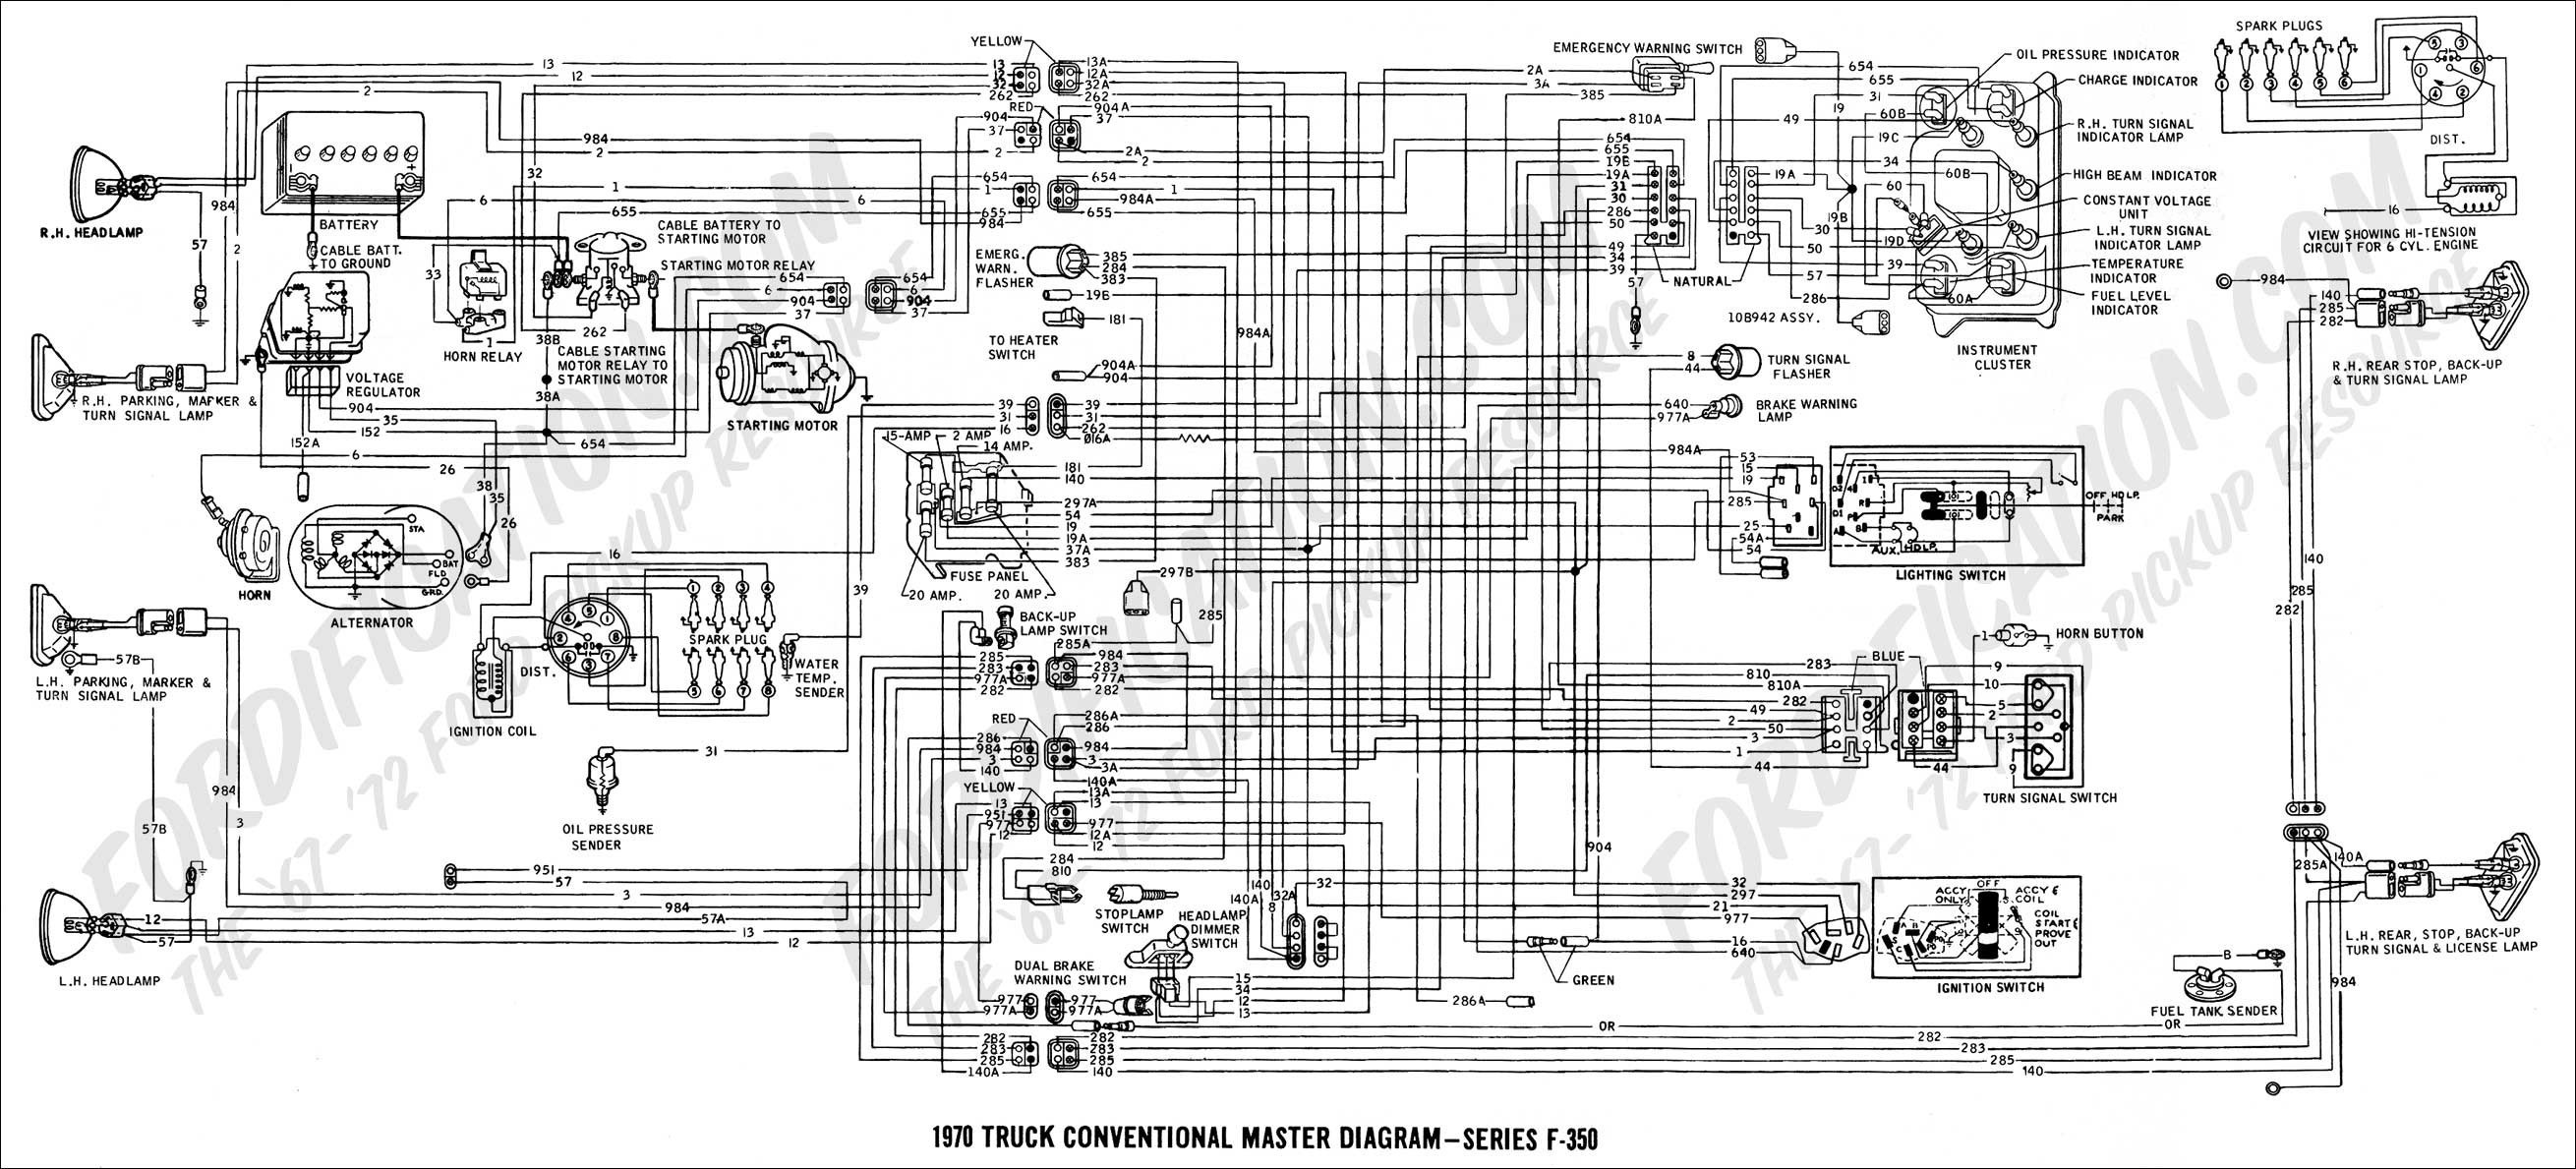 Strange Ford Windstar Heater Core Hose Diagram Free Download Wiring Diagrams Wiring Cloud Icalpermsplehendilmohammedshrineorg